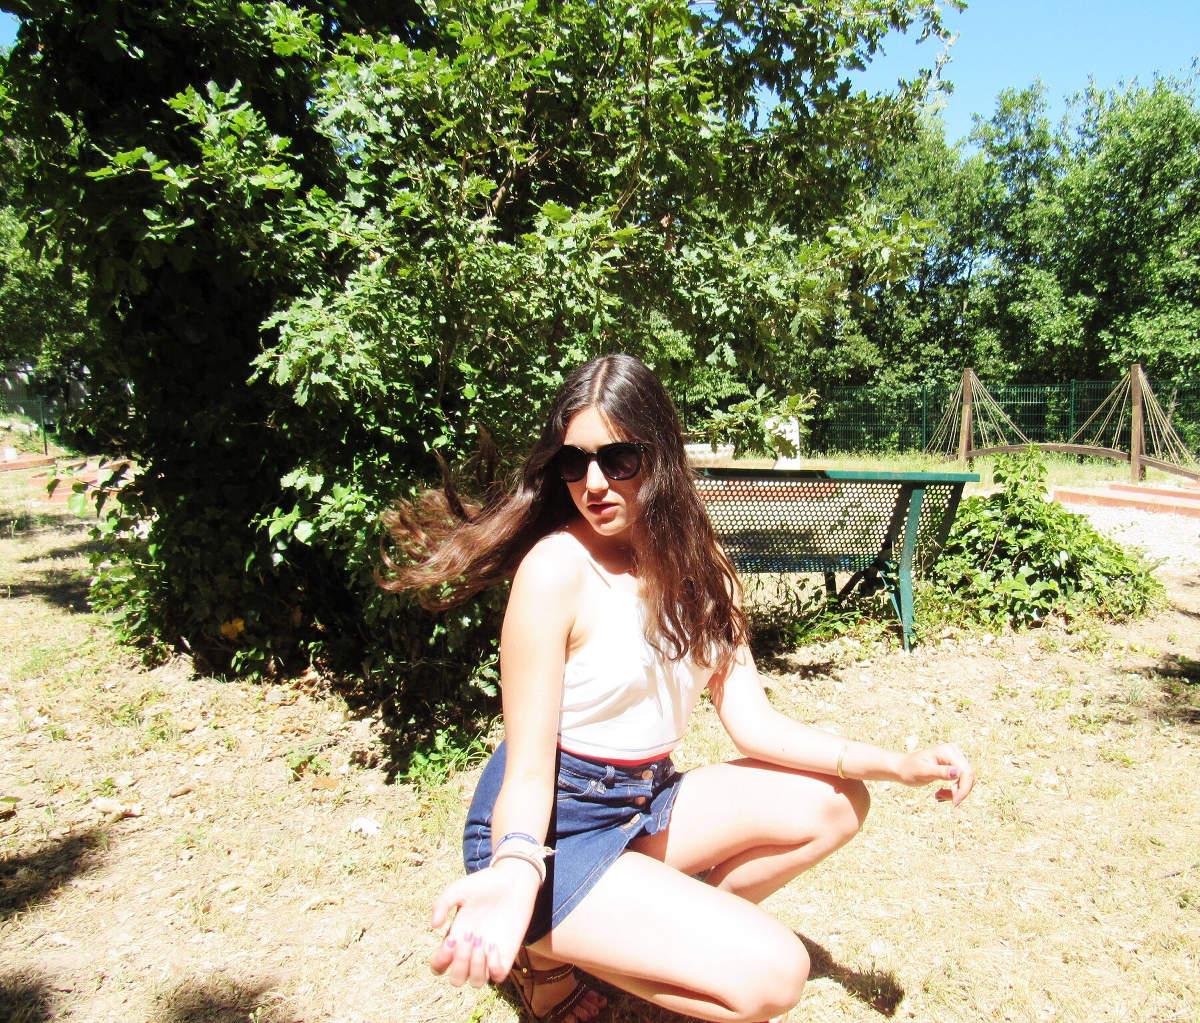 Bikini vacaciones de verano